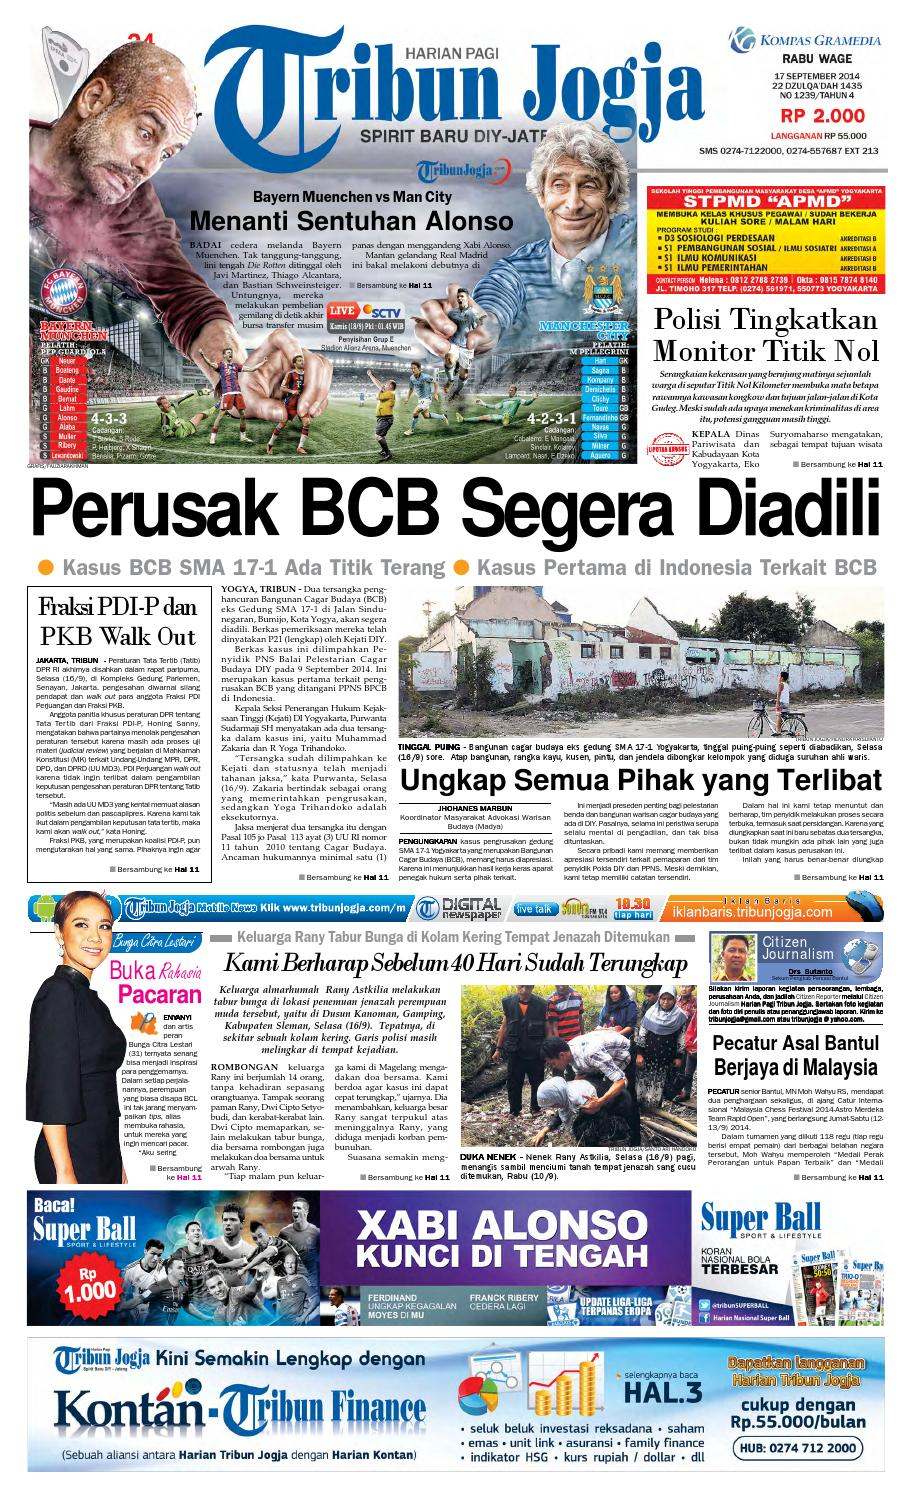 Tribunjogja 17 09 2014 By Tribun Jogja Issuu Regulator Kompor Gas Dengan Metersniaman Awet Dan Efisien